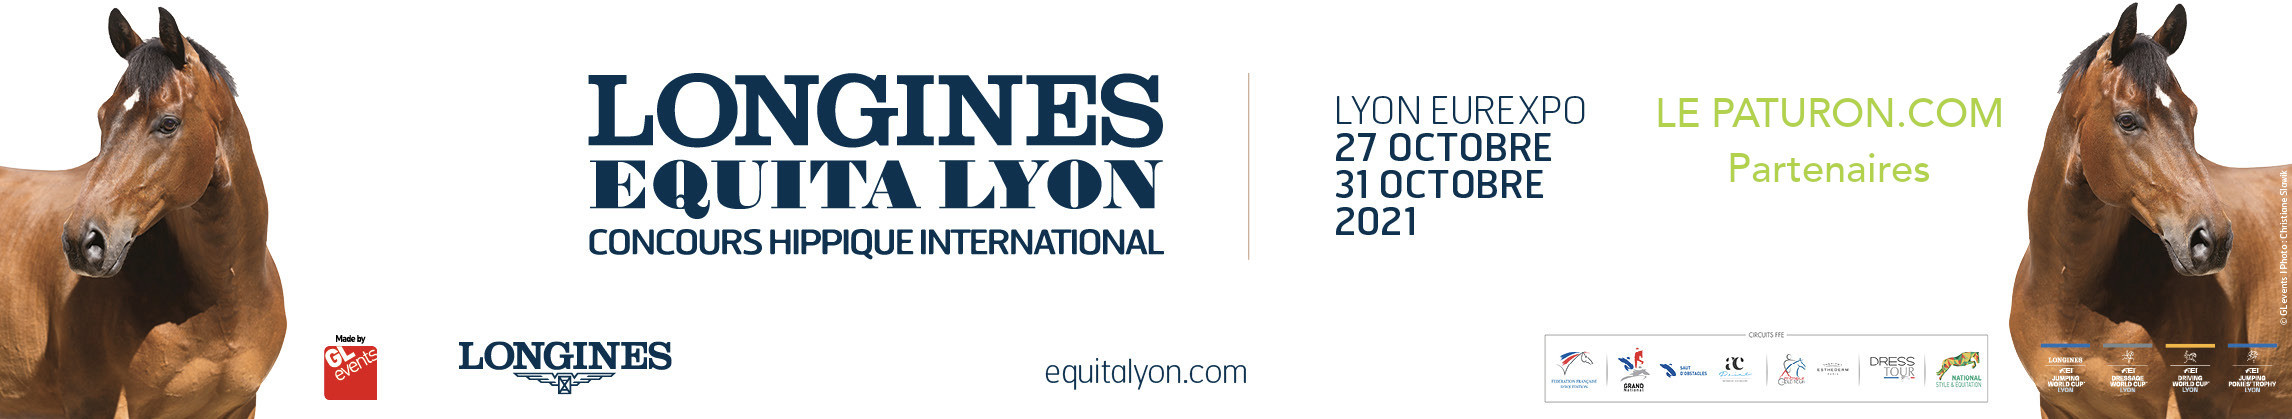 Equita Lyon 2021 Longines Equita Lyon - Le Paturon